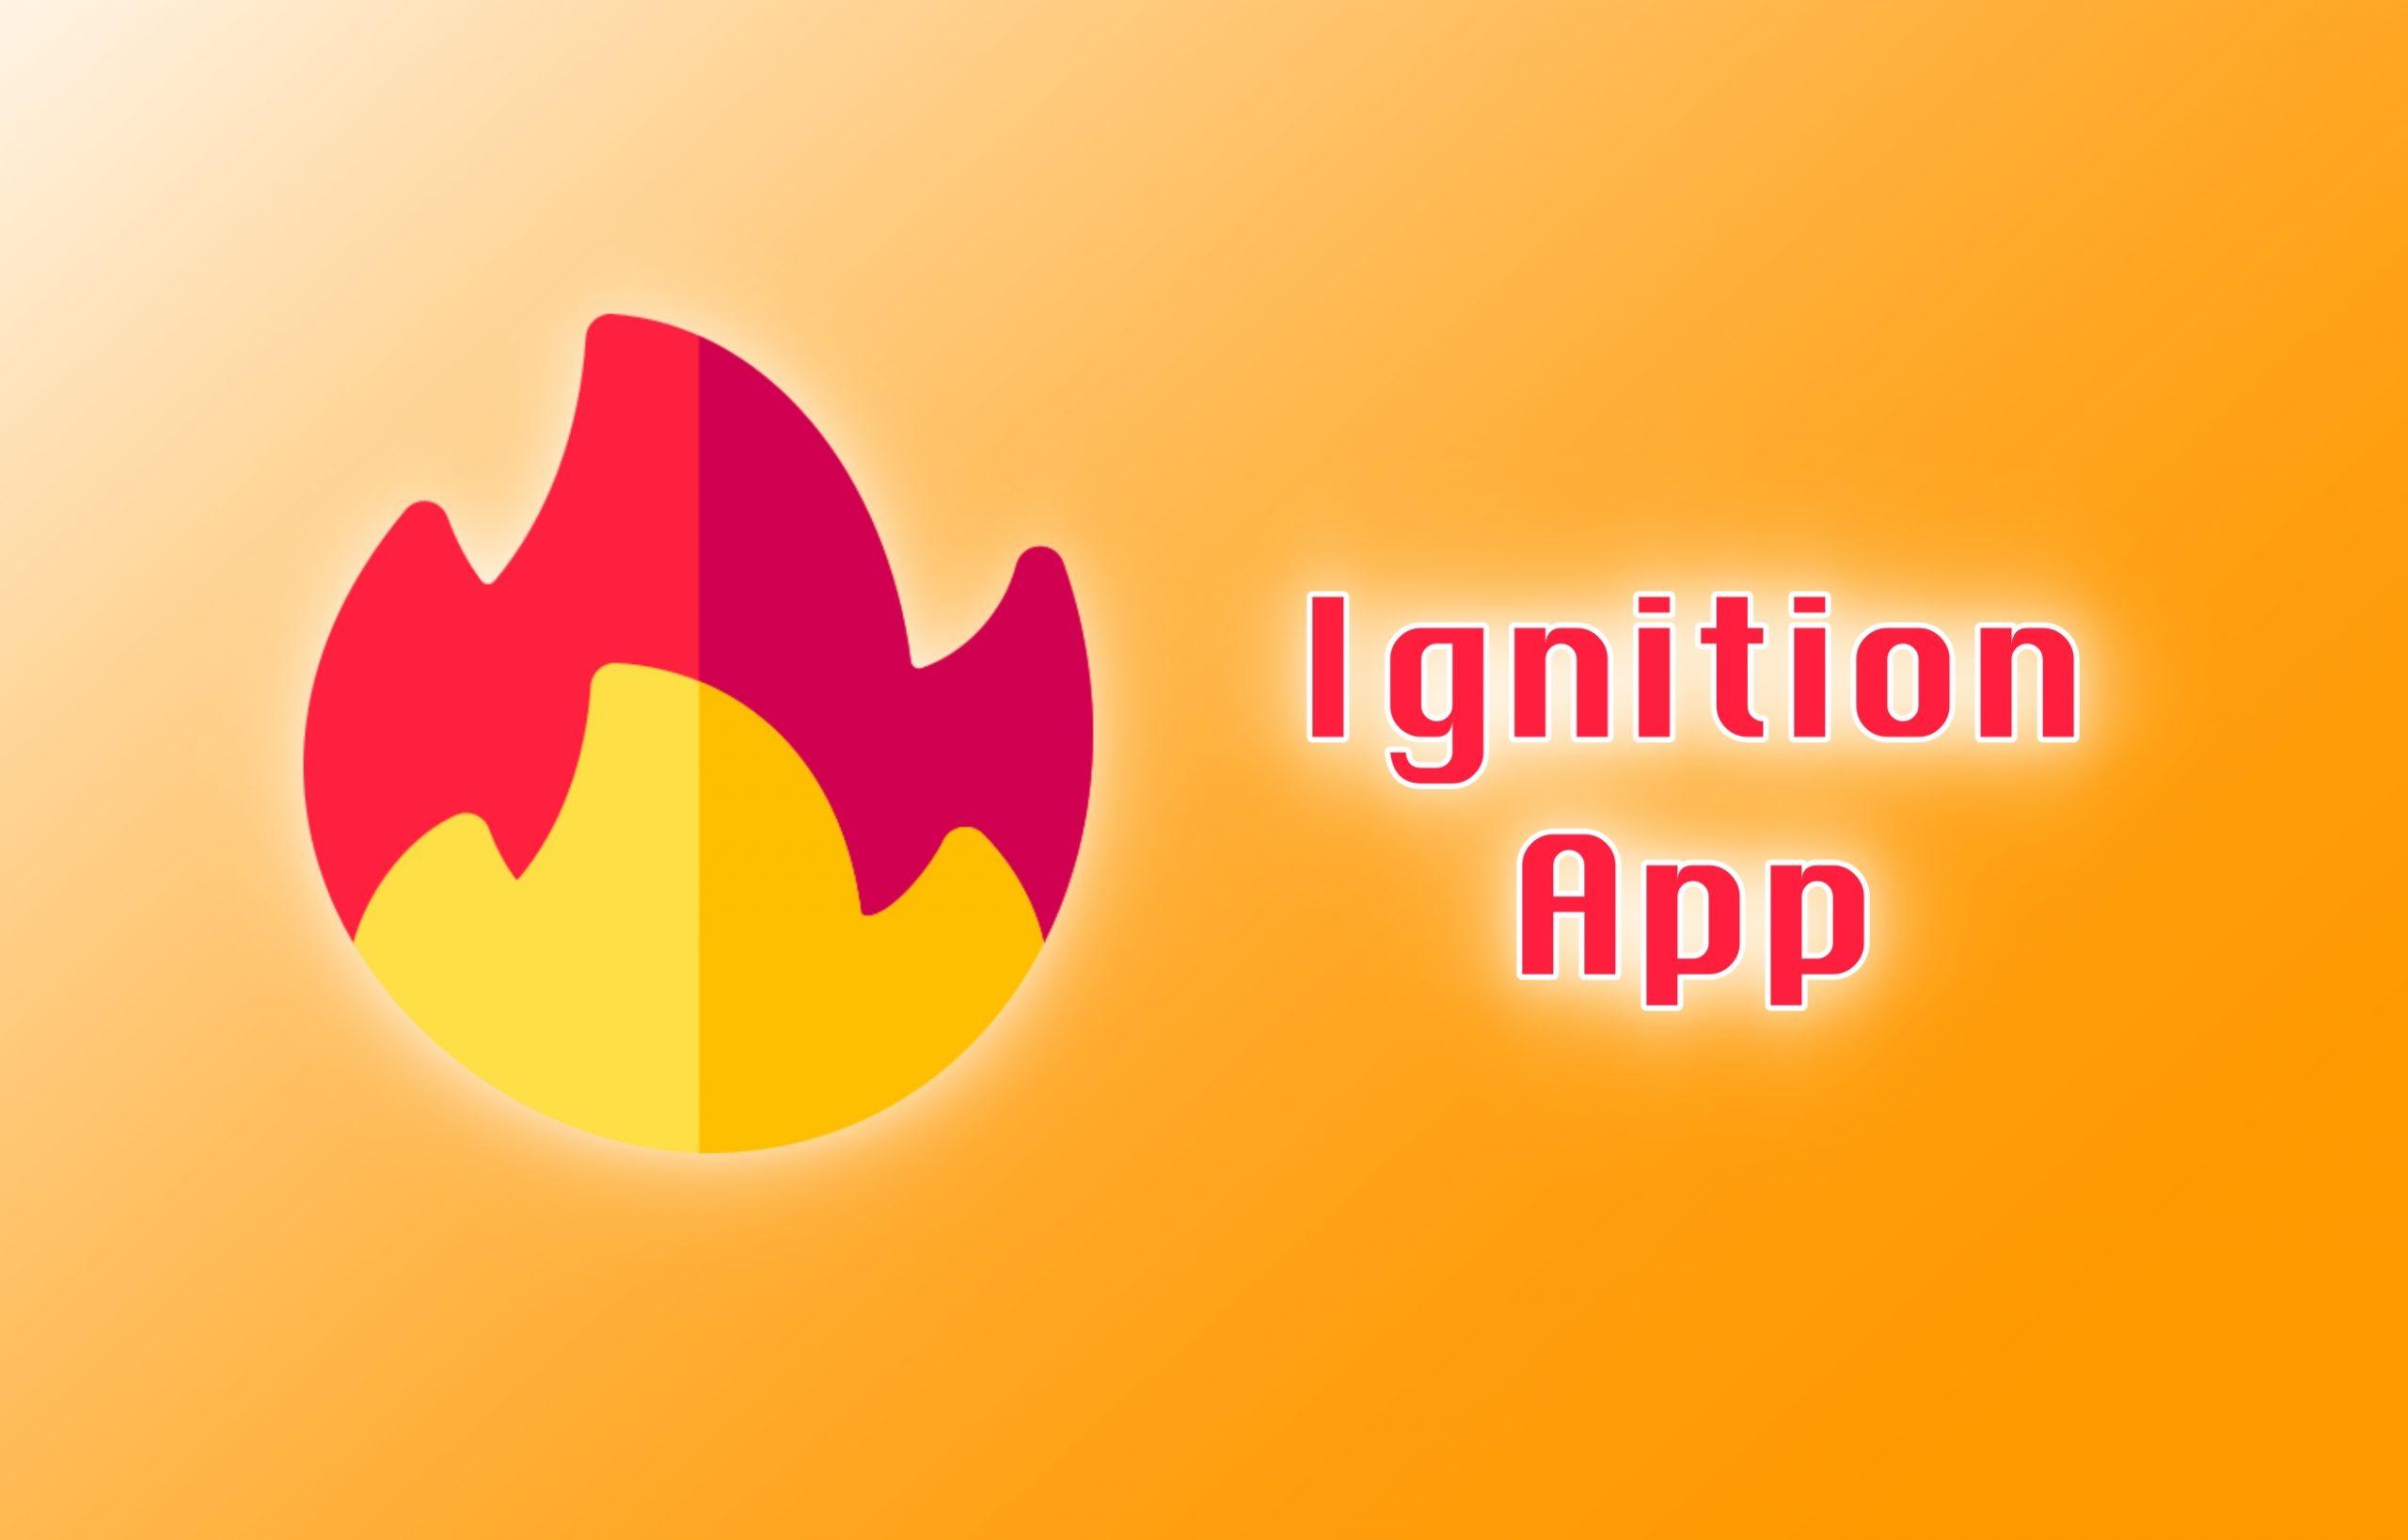 Ignition App